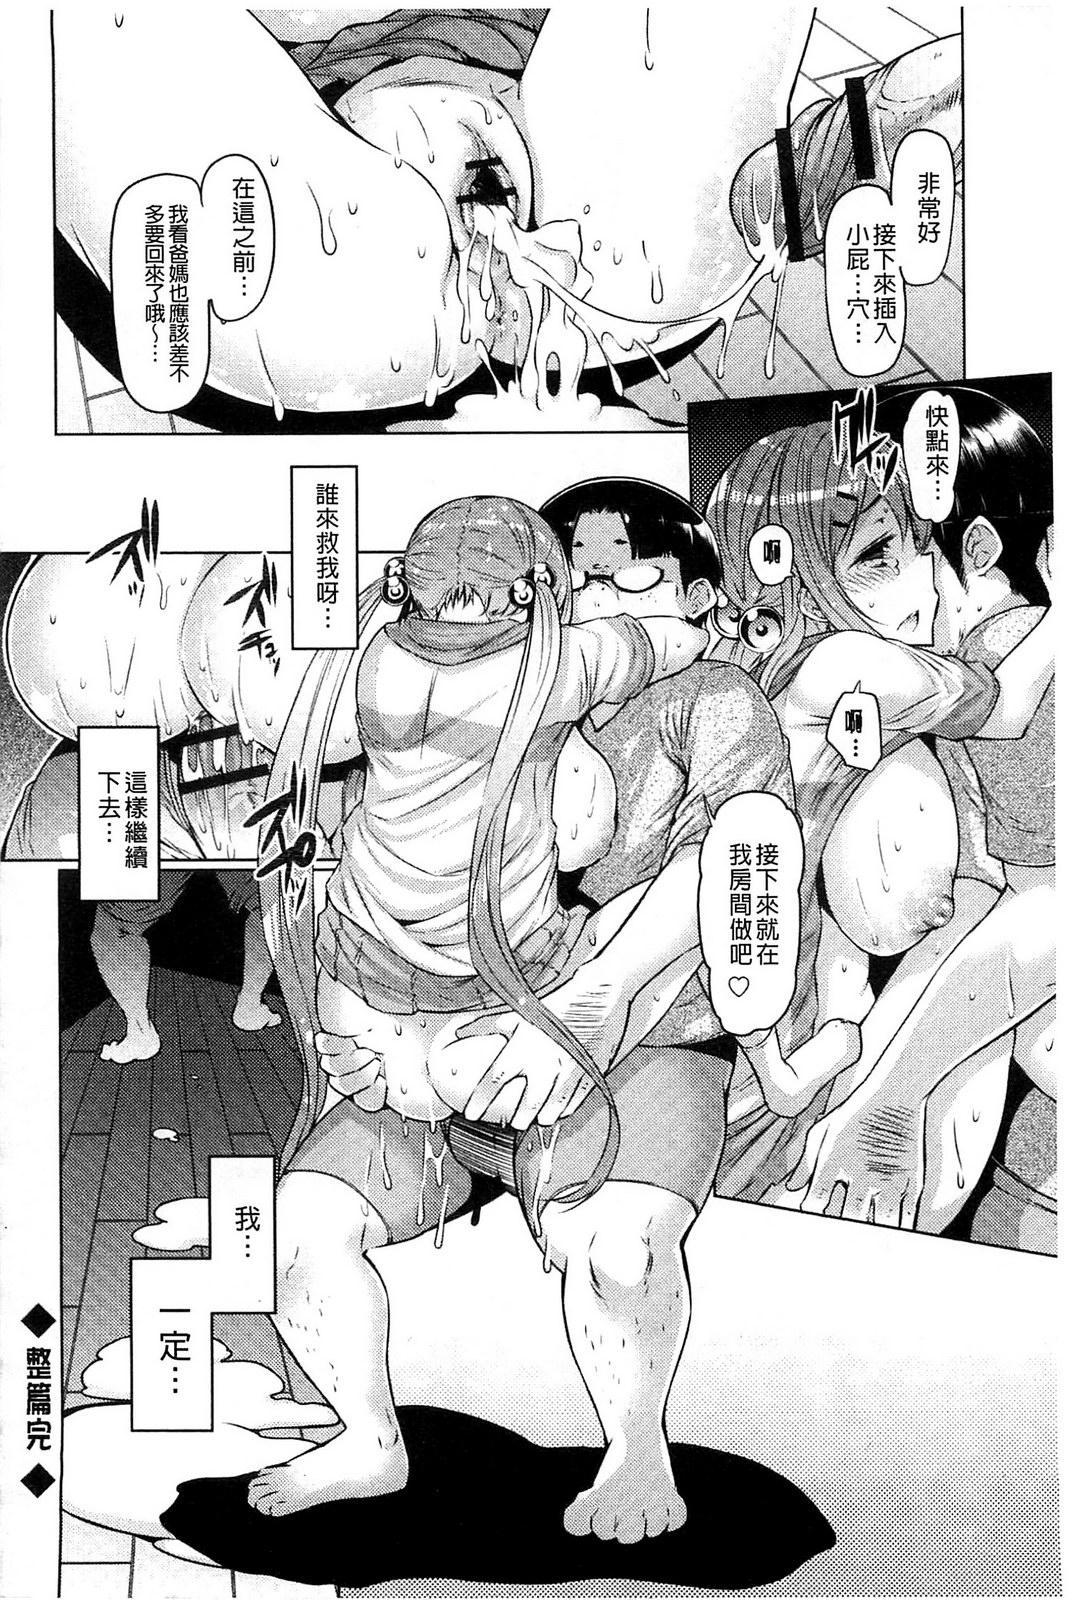 Imouto Kansatsu Nikki - The Record of Sex with My Sister 168